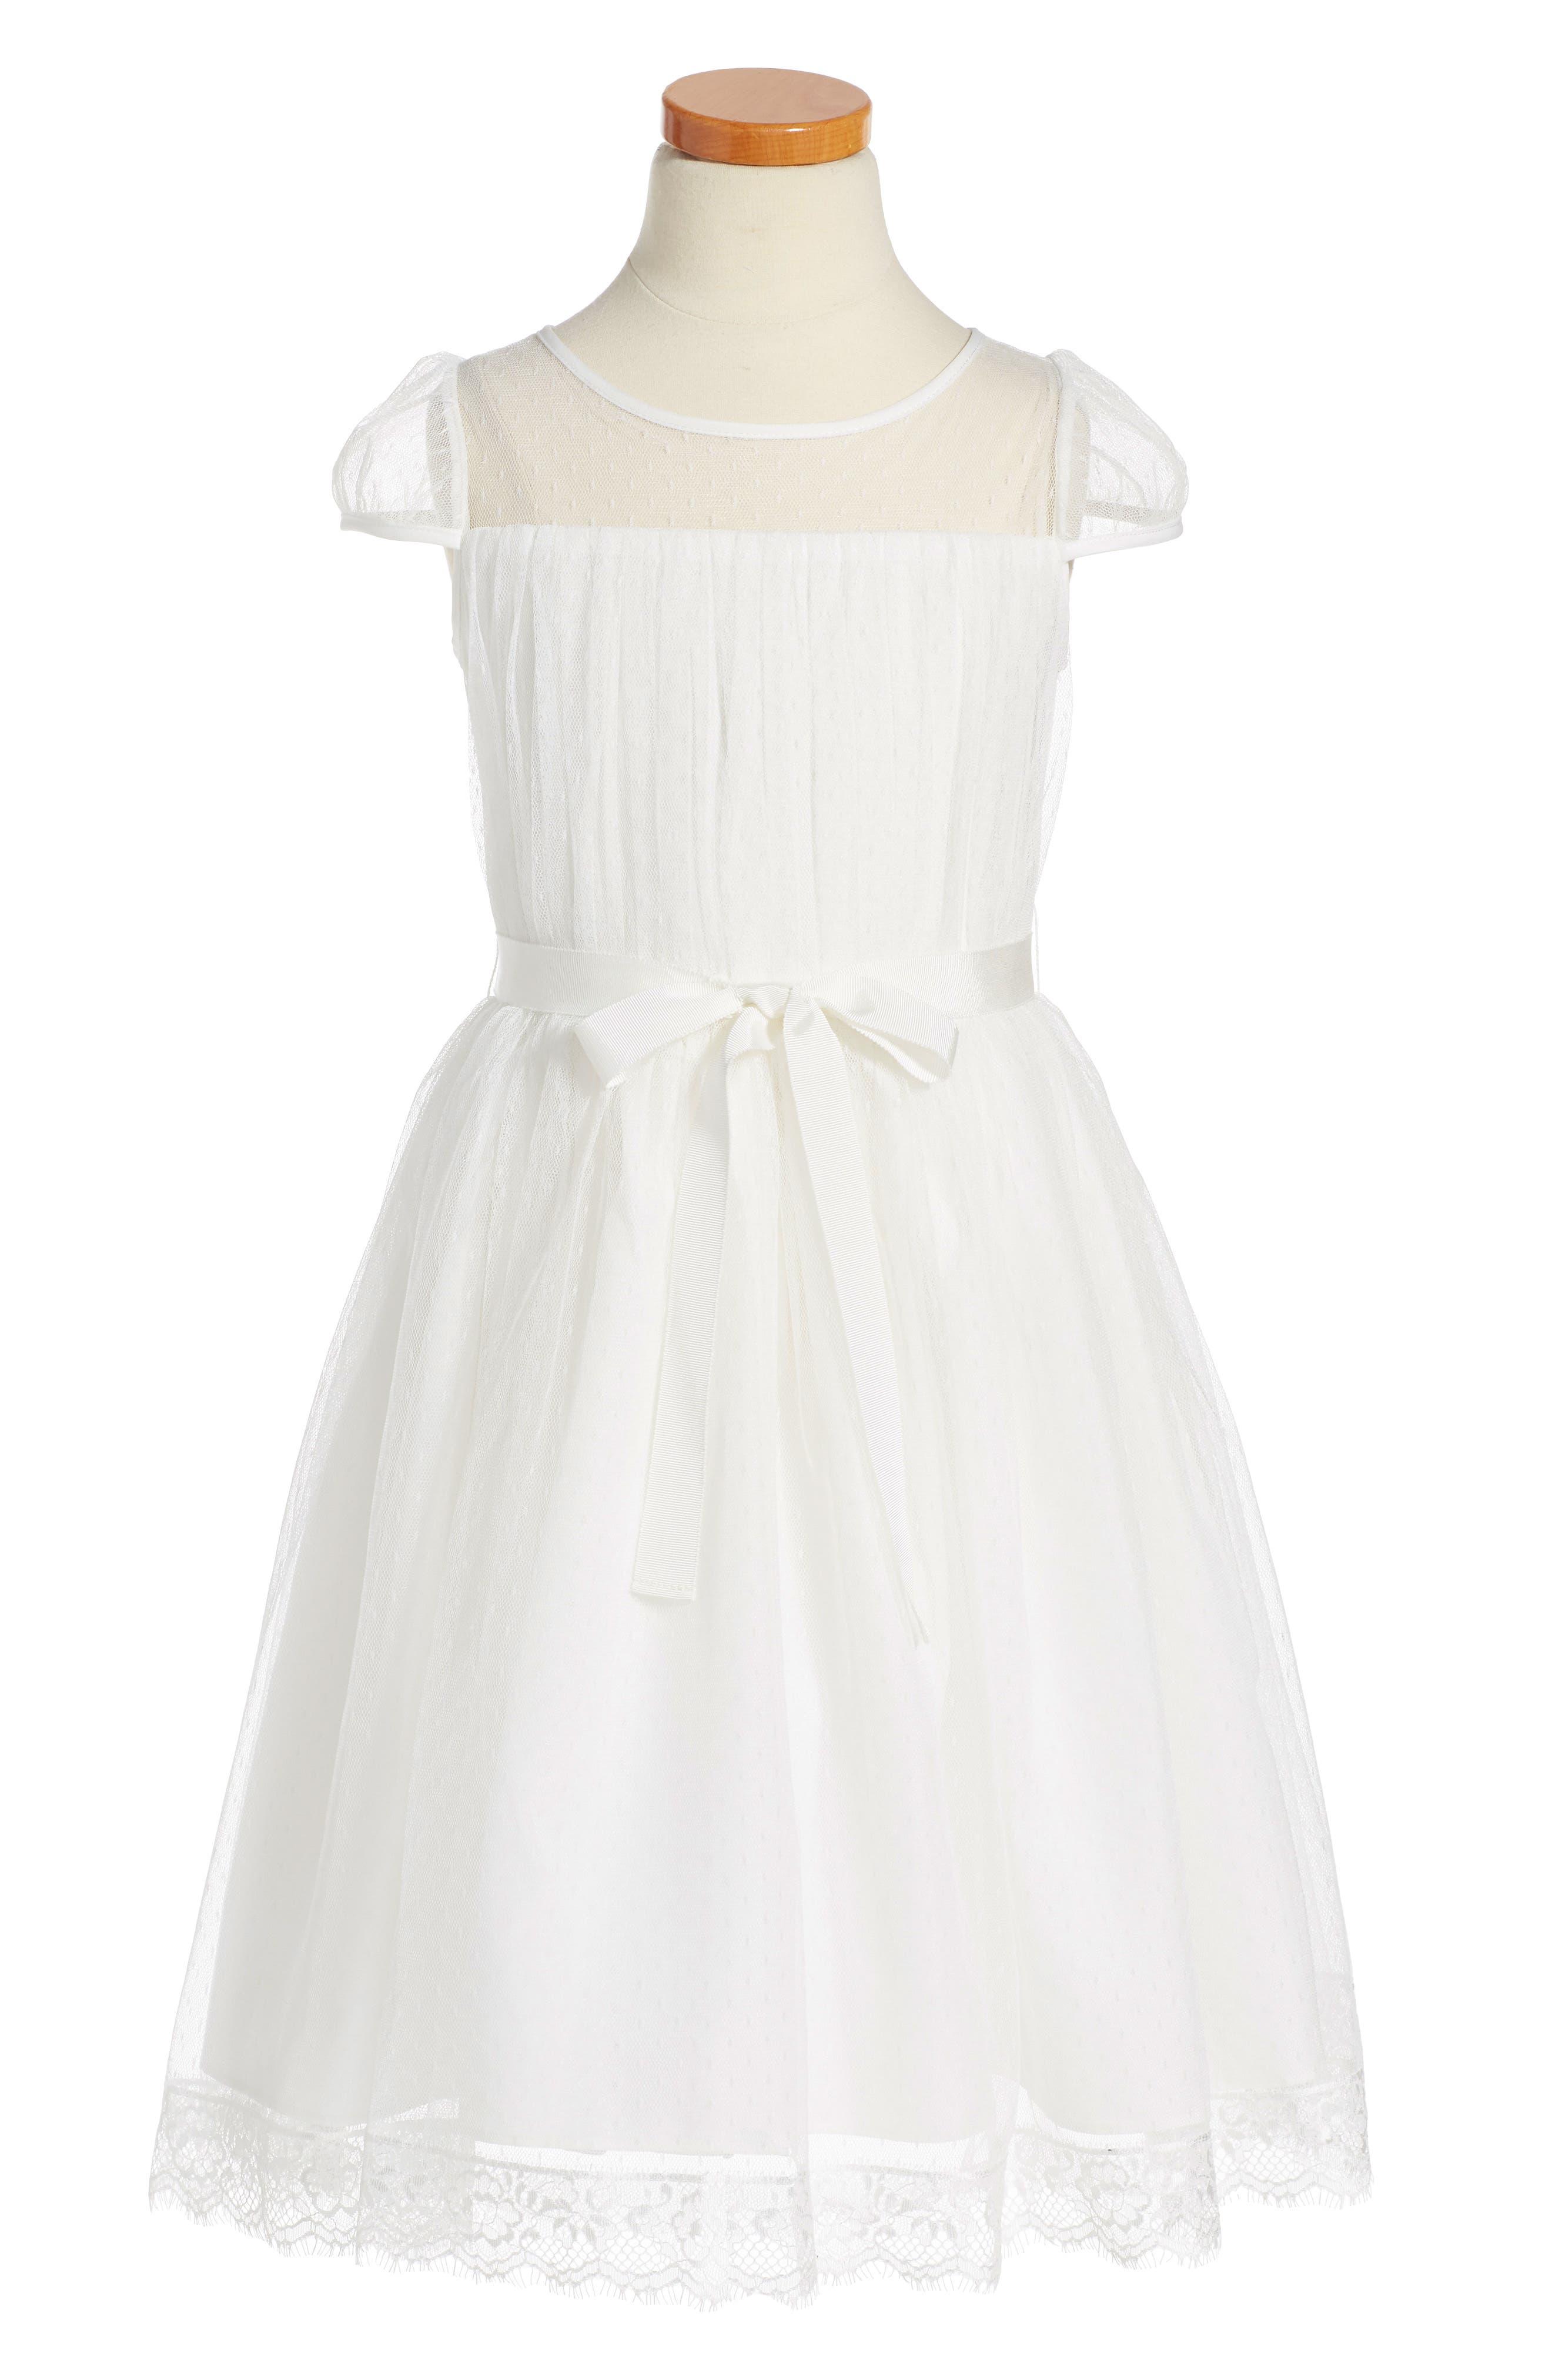 Alternate Image 1 Selected - Us Angels Point d'Esprit Dress (Toddler Girls, Little Girls & Big Girls)